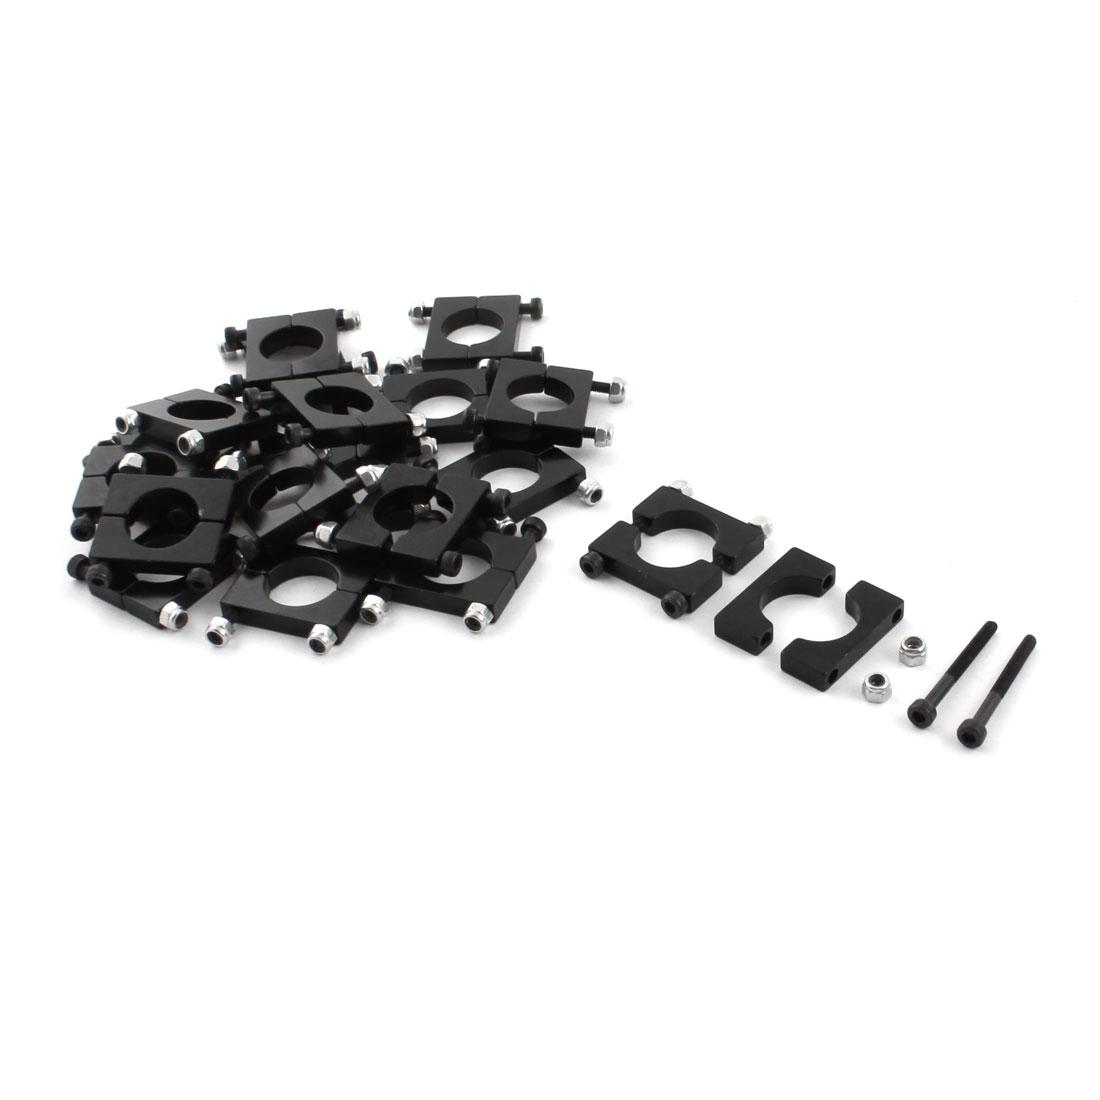 20 Pcs 16mm Black Aluminum Clamp for Carbon Fiber Tube RC Quadcopter Hexrcopter